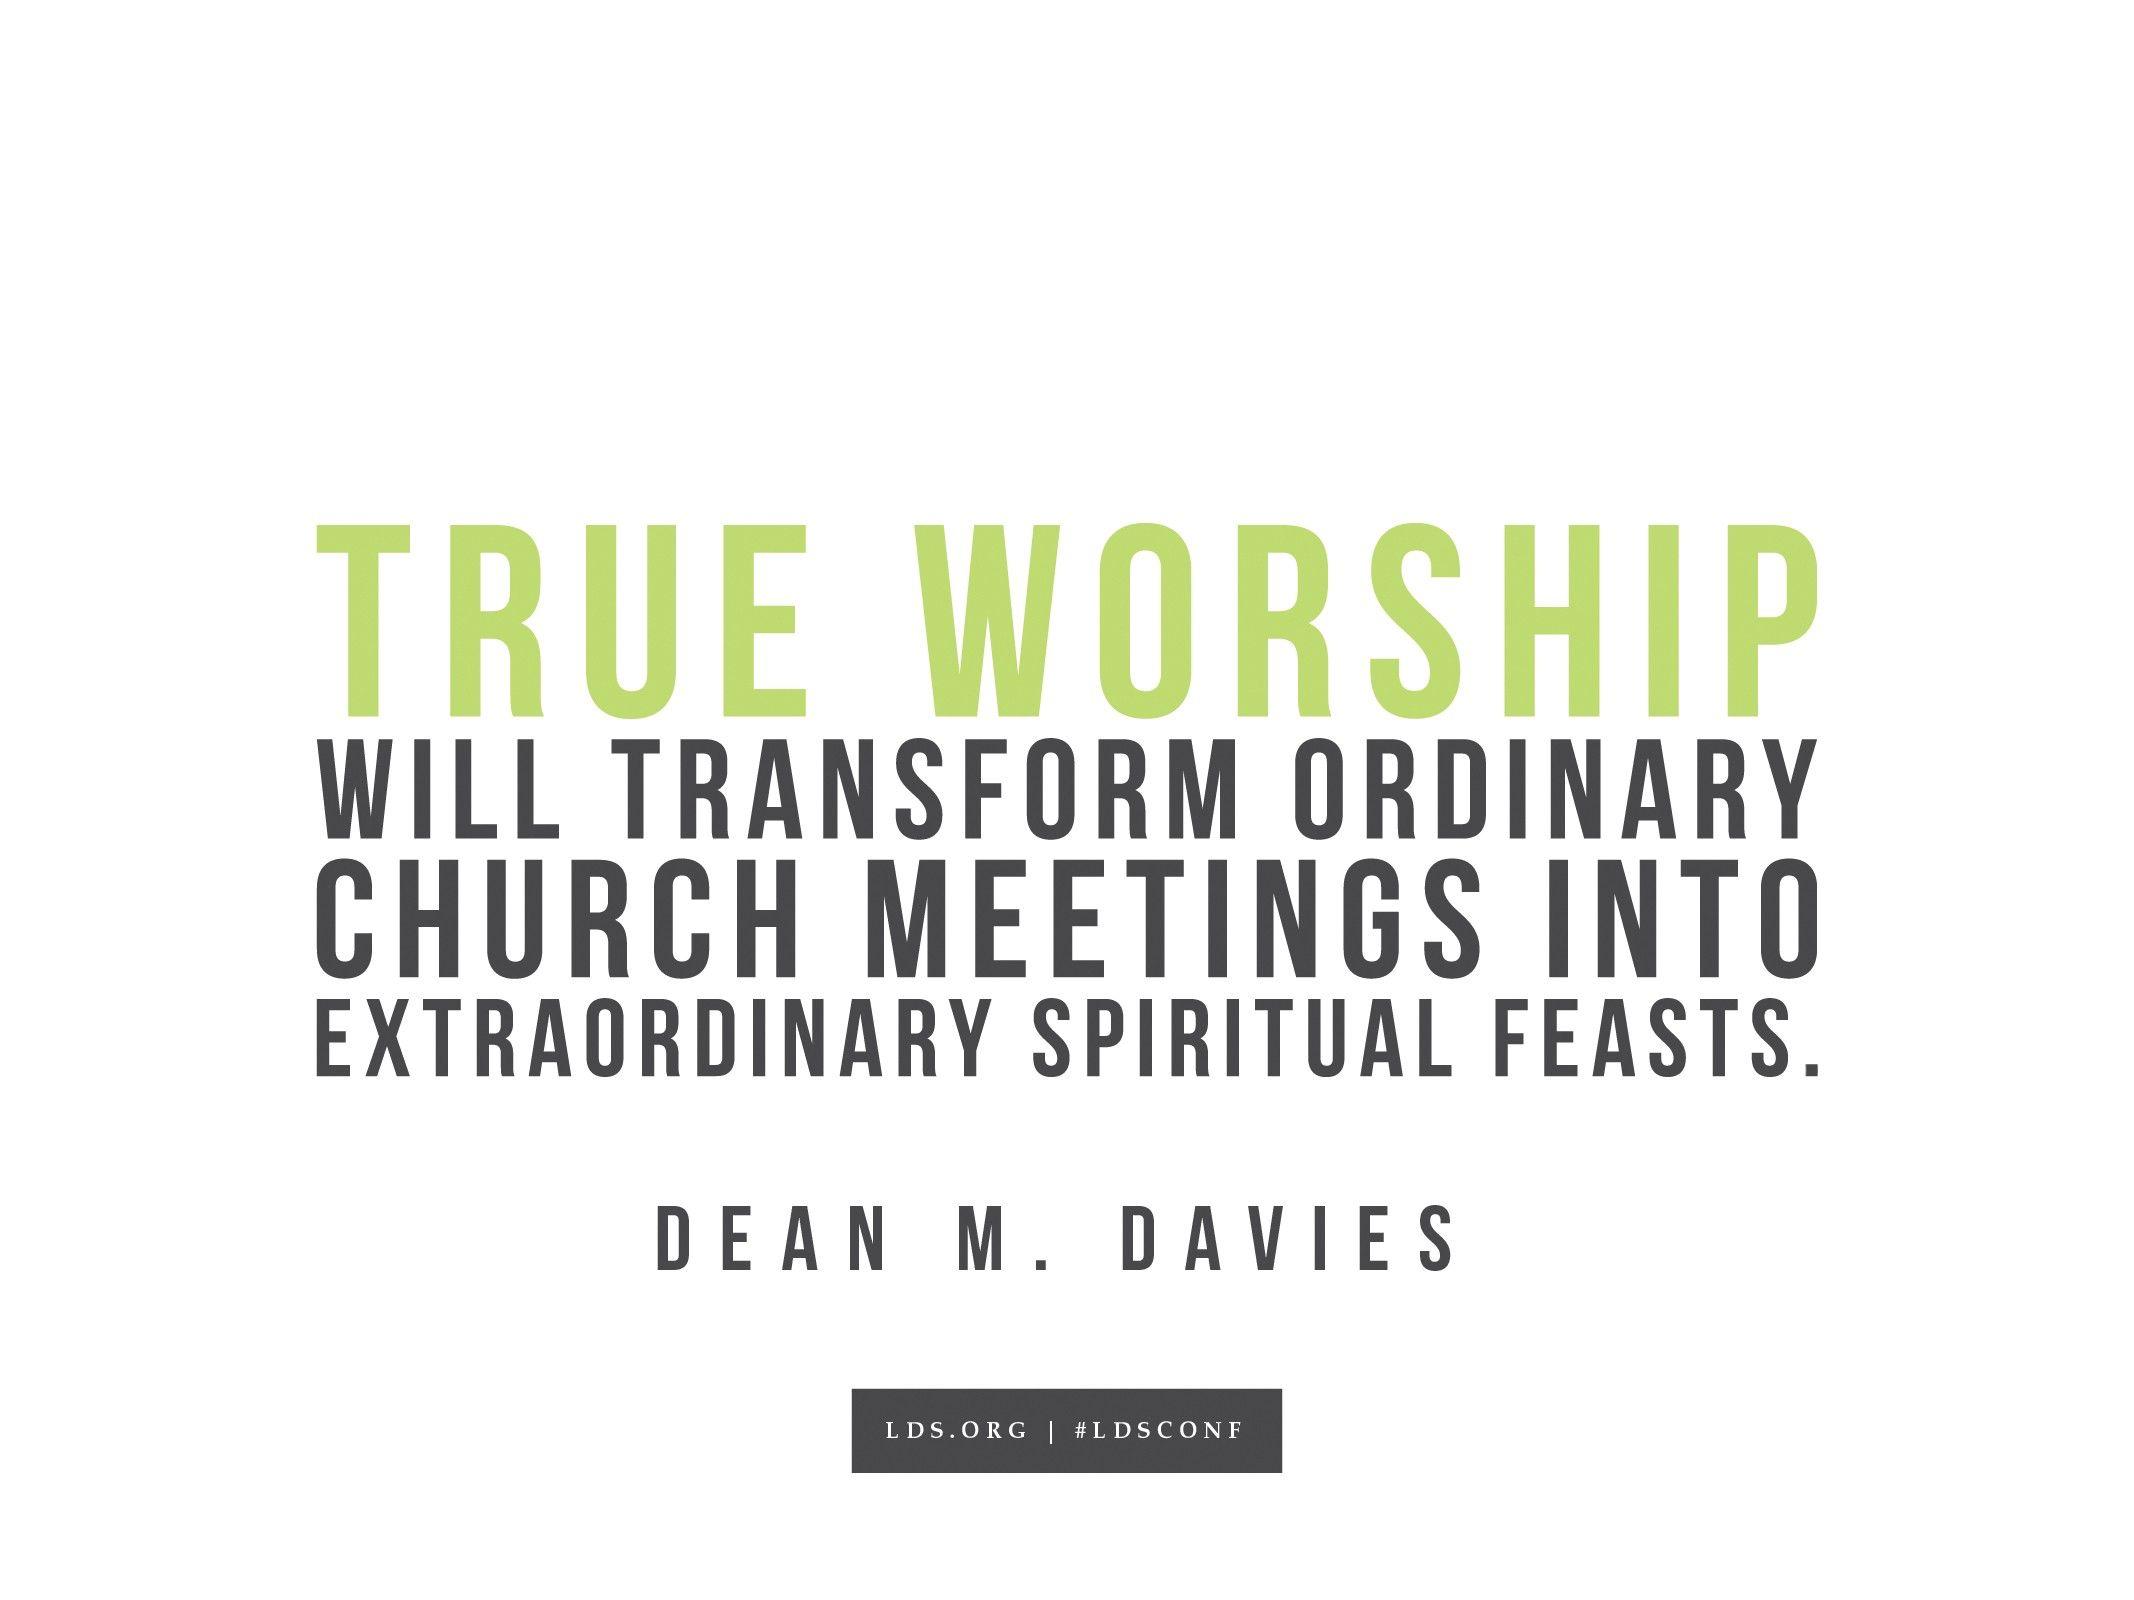 """True worship will transform ordinary Church meetings into extraordinary spiritual feasts.""—Dean M. Davies, ""The Blessings of Worship"""